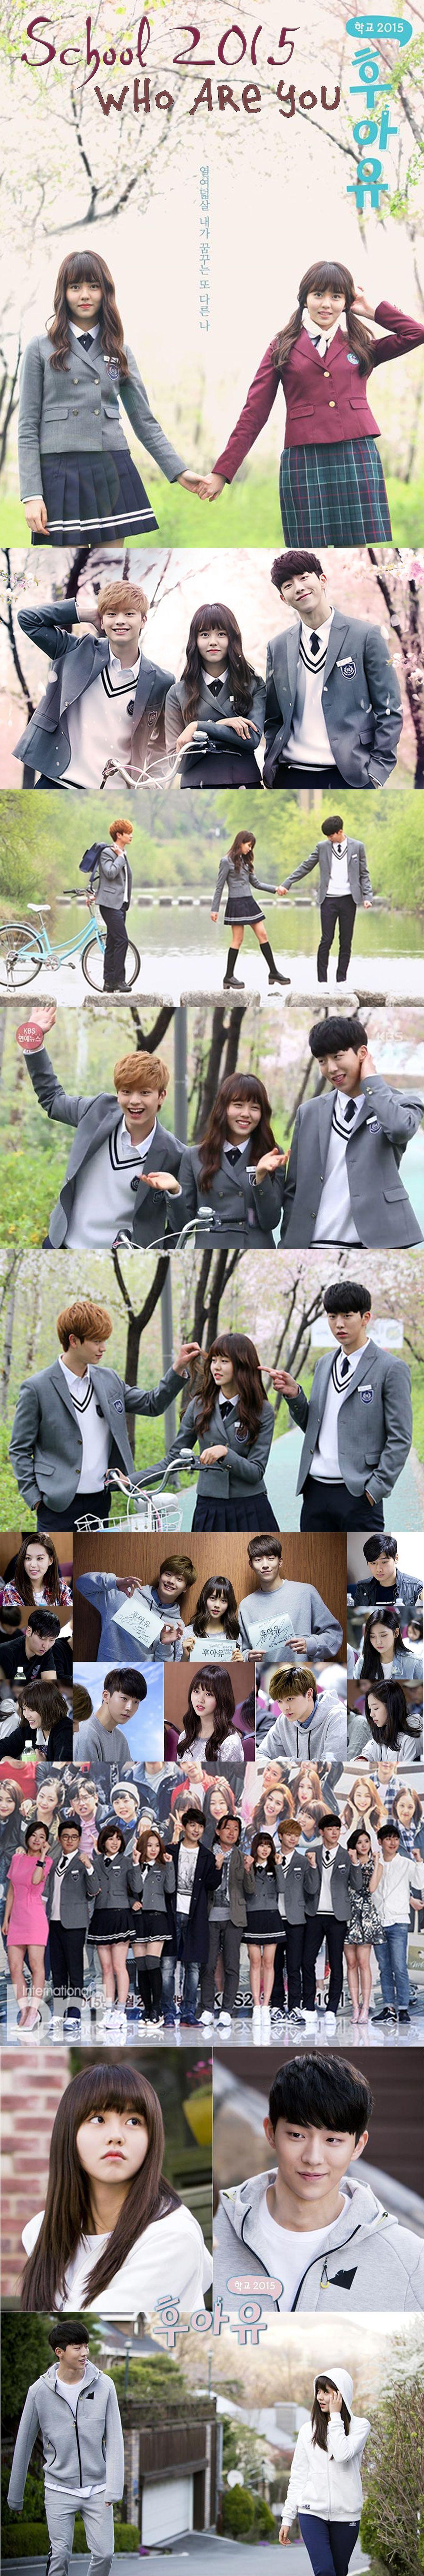 School 2015: Who are you (후아유- 학교 2015) Kdrama 2015 - 16 episodes - Kim So-Hyun / Nam Joo-Hyuk / Yook Sung-Jae / Lee Pil-Mo